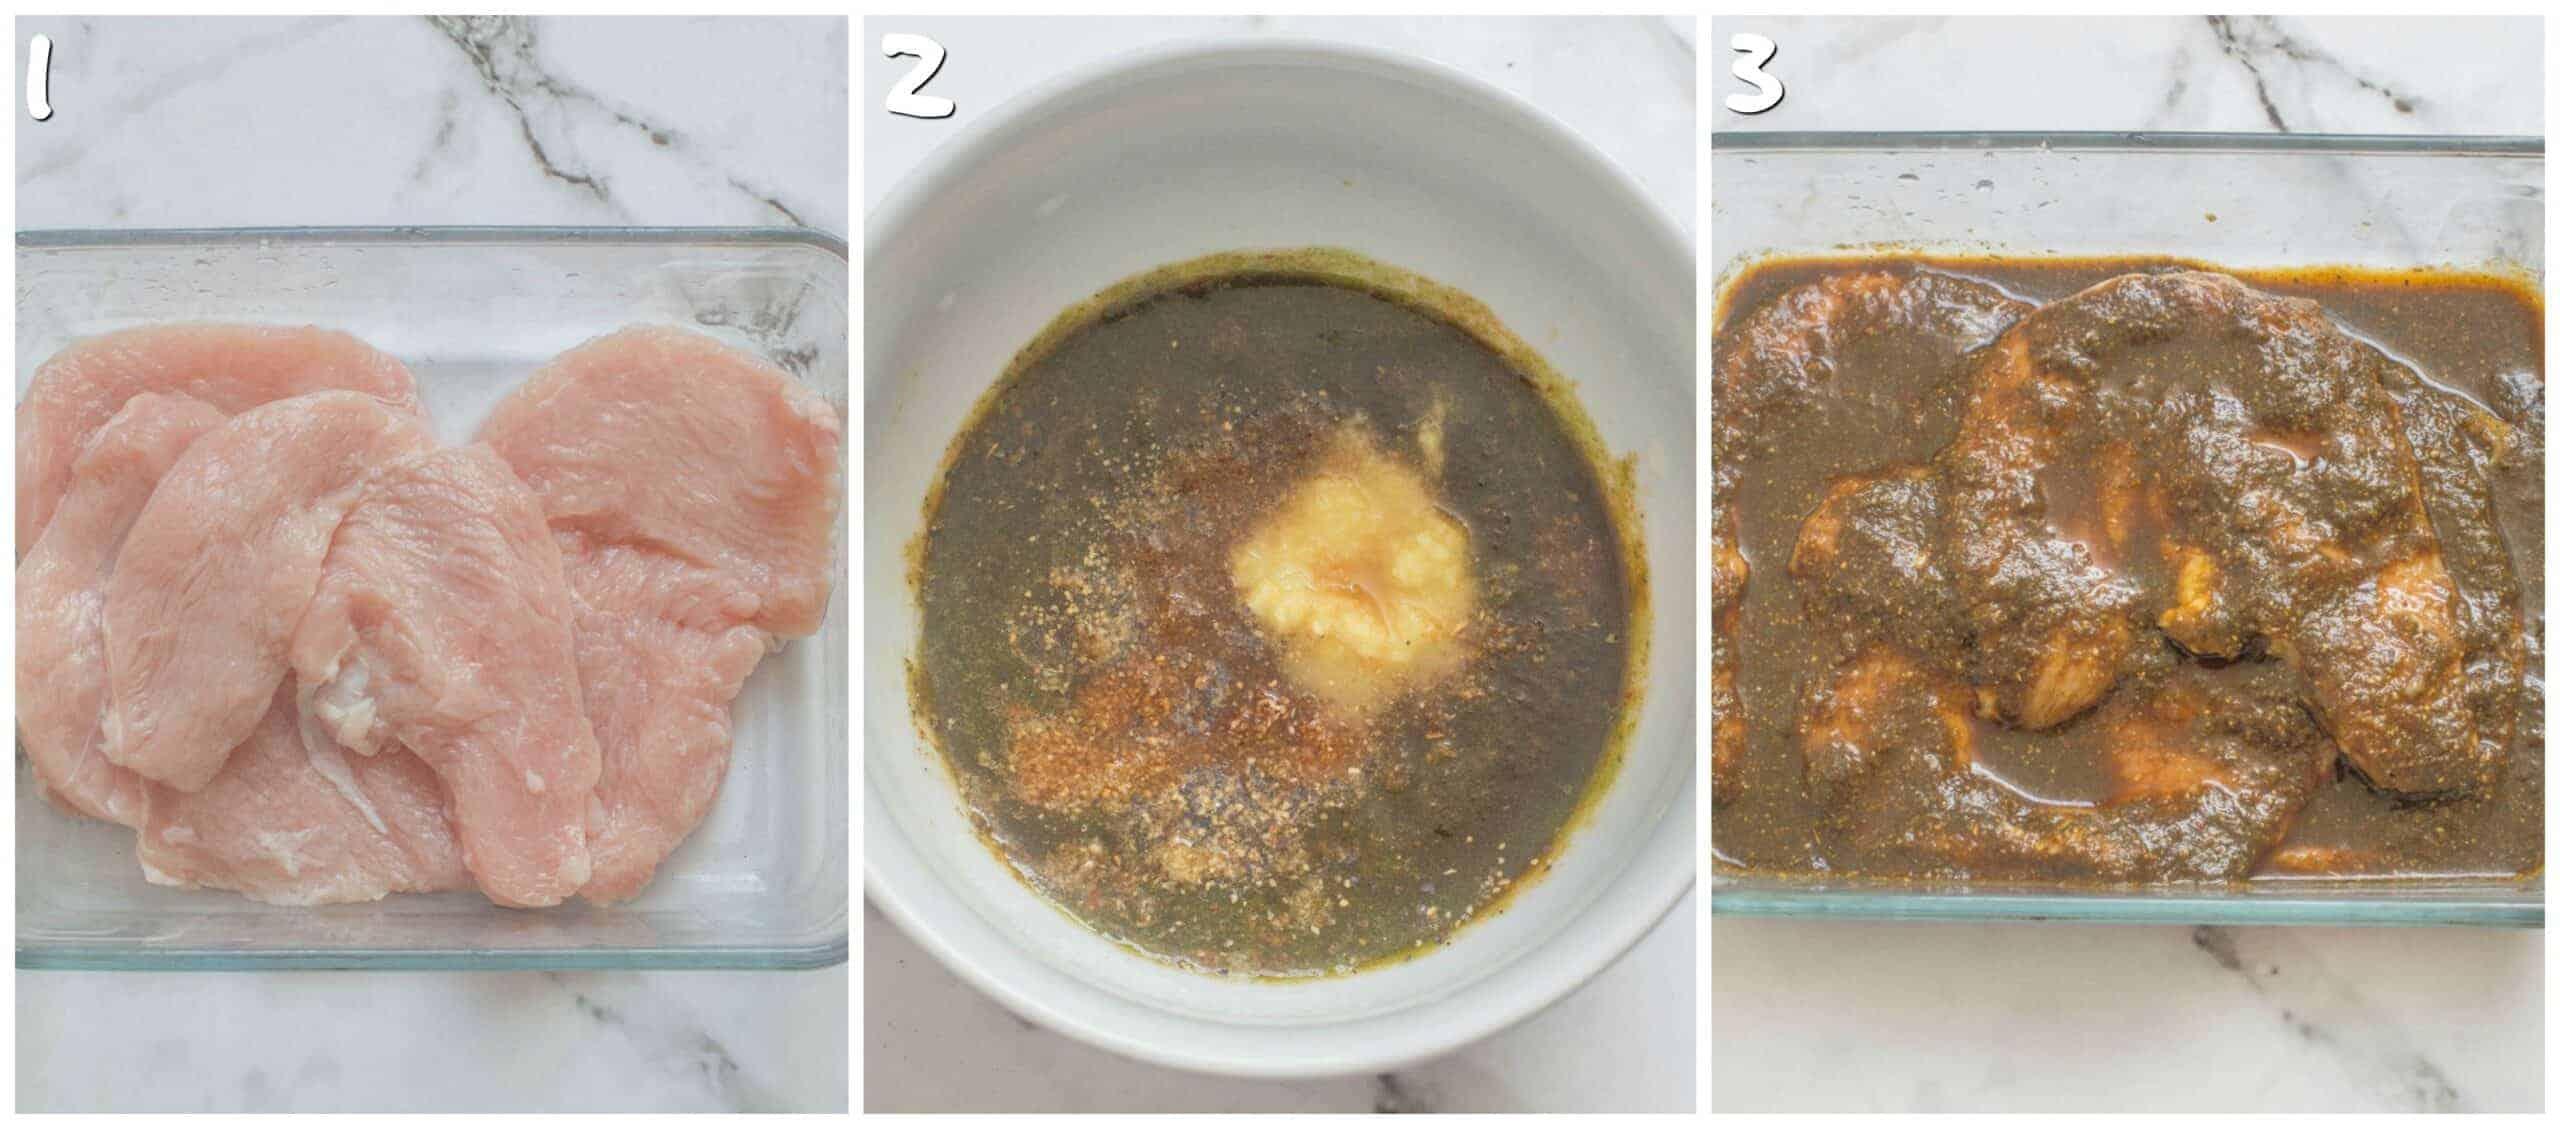 steps 1-3 marinating the turkey steaks